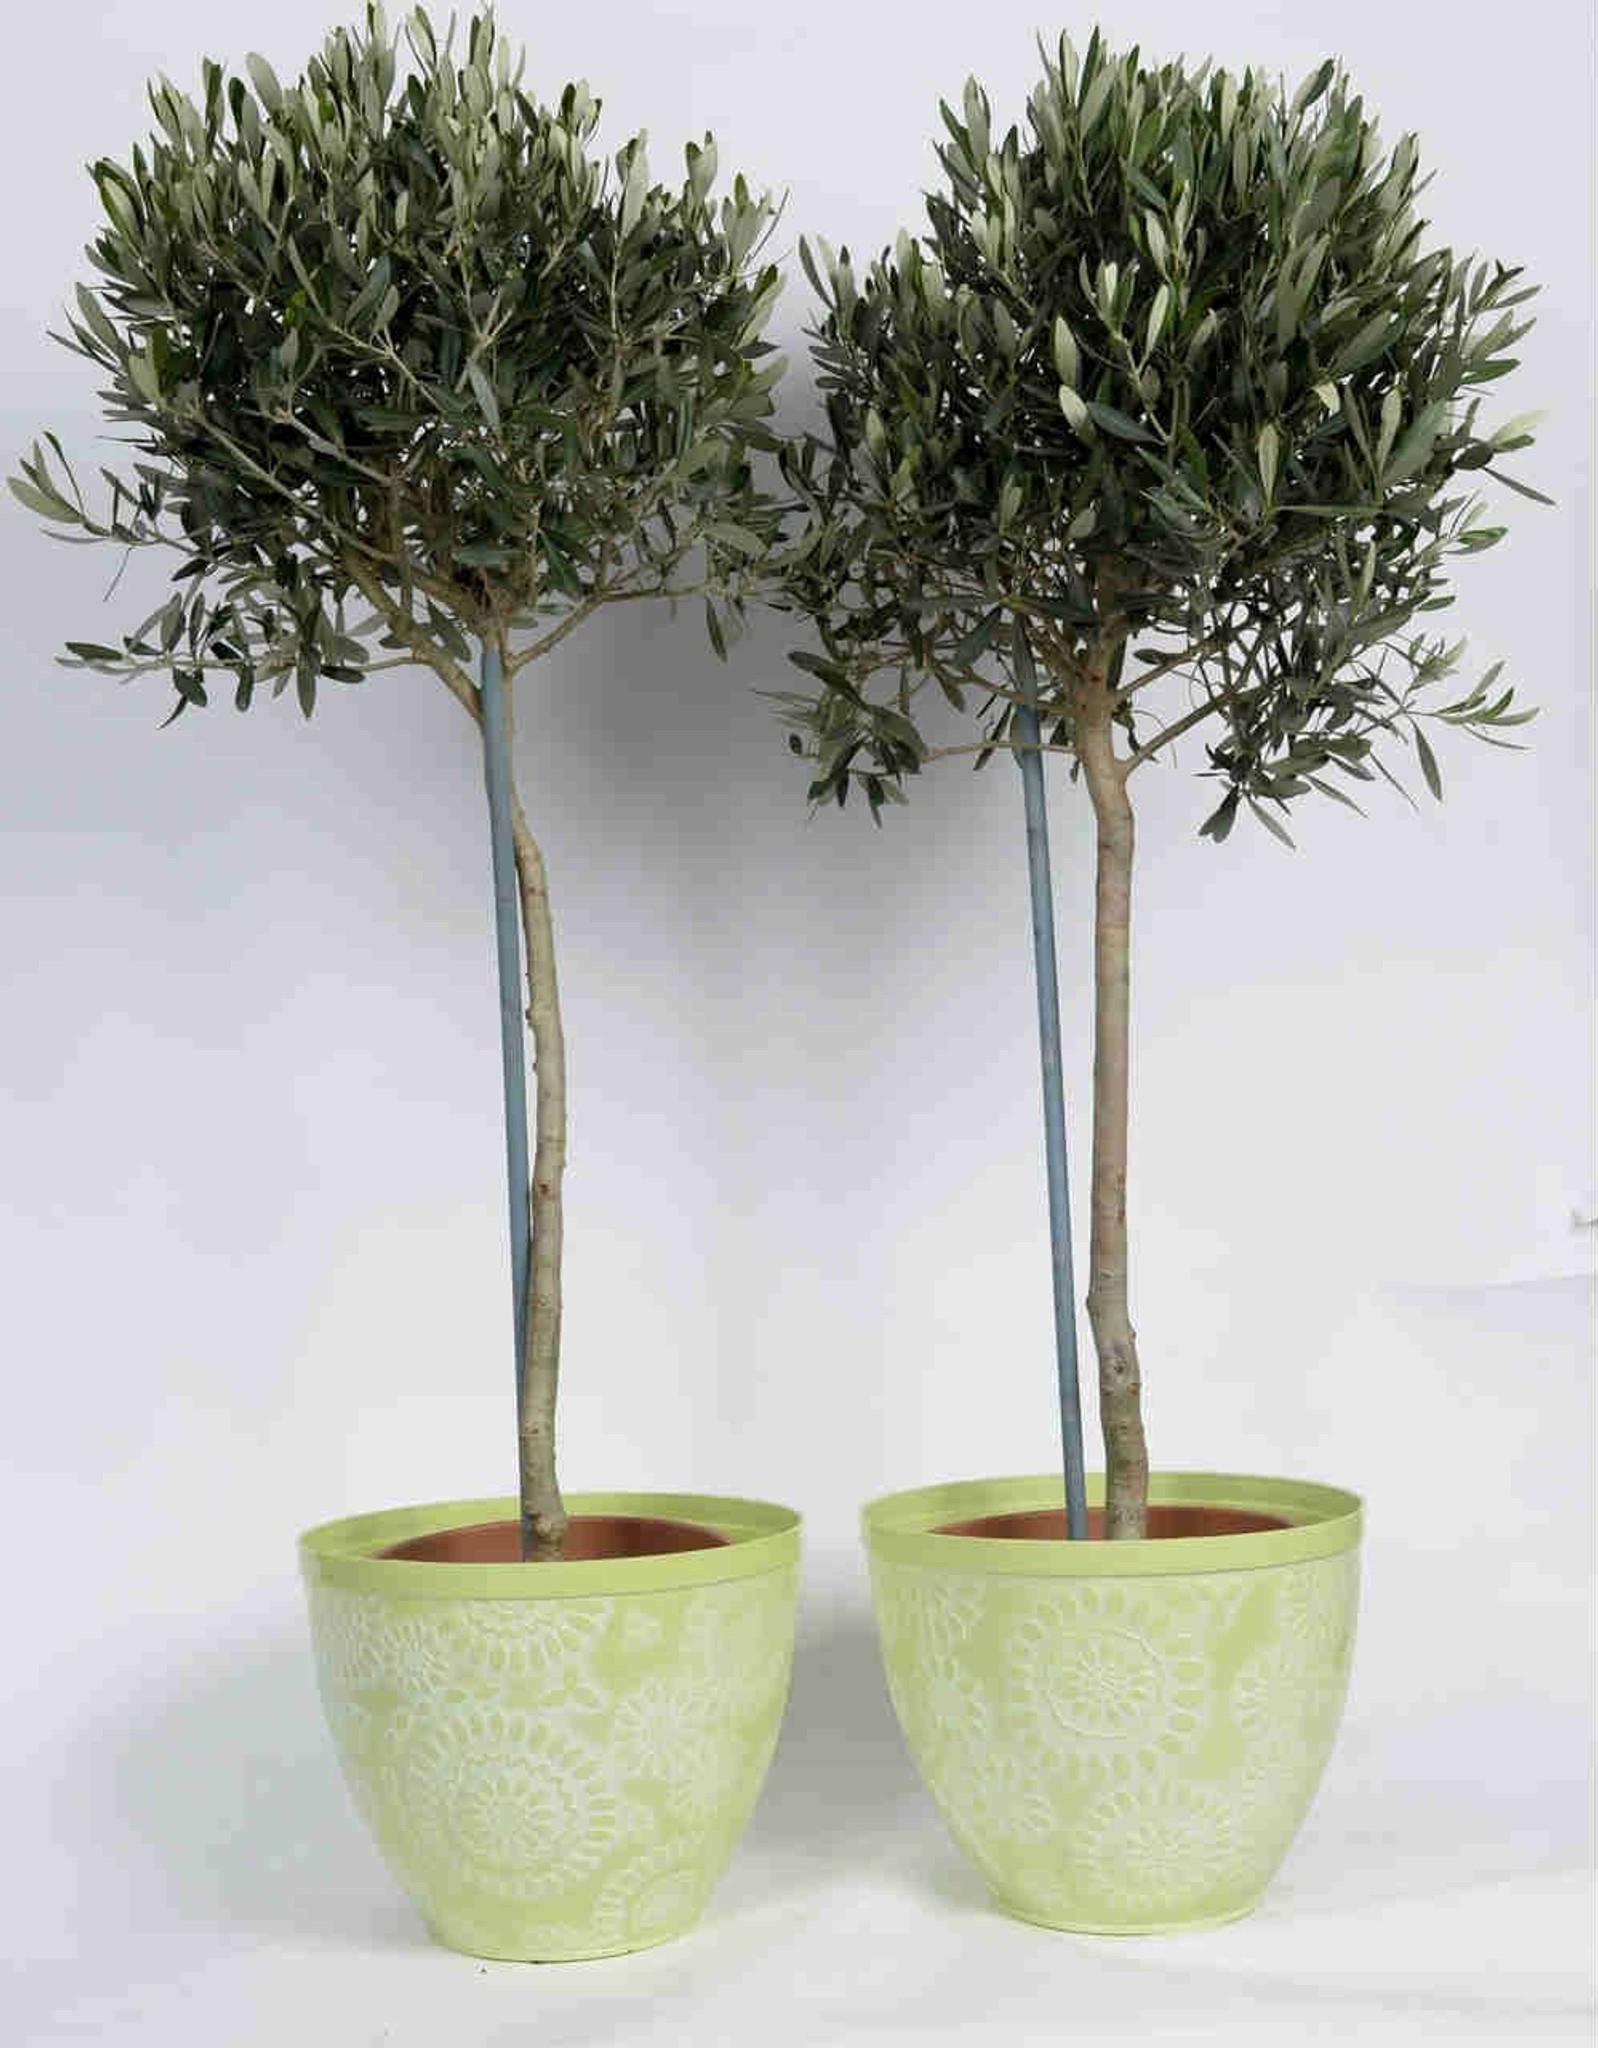 Light Green Floral pot with Olives